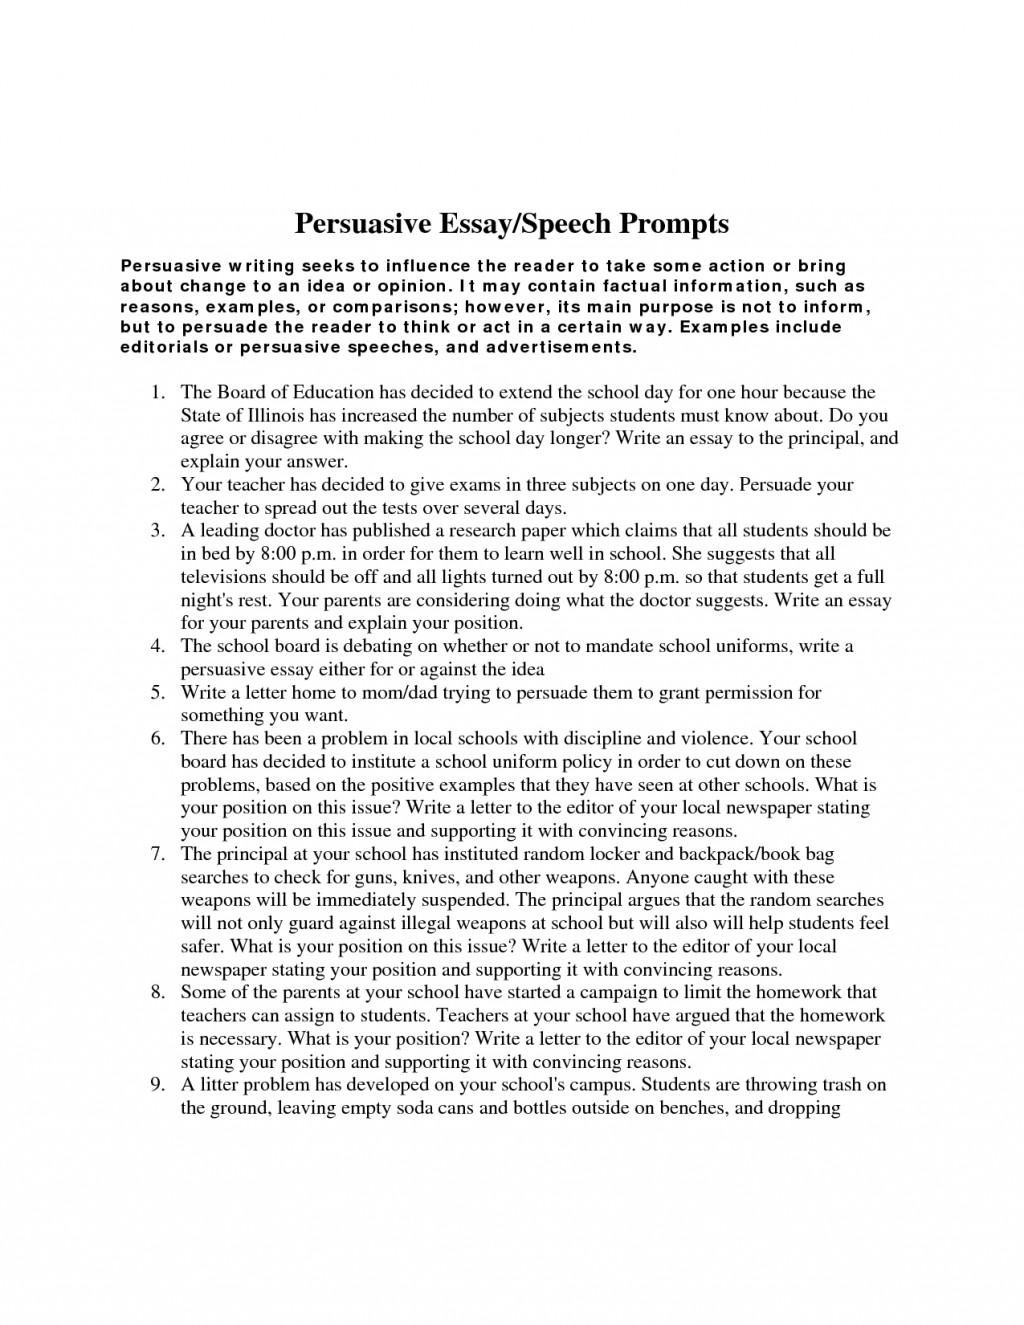 020 Persuasive Essay Prompts Good Topics Amazing For College Argumentative High School Large